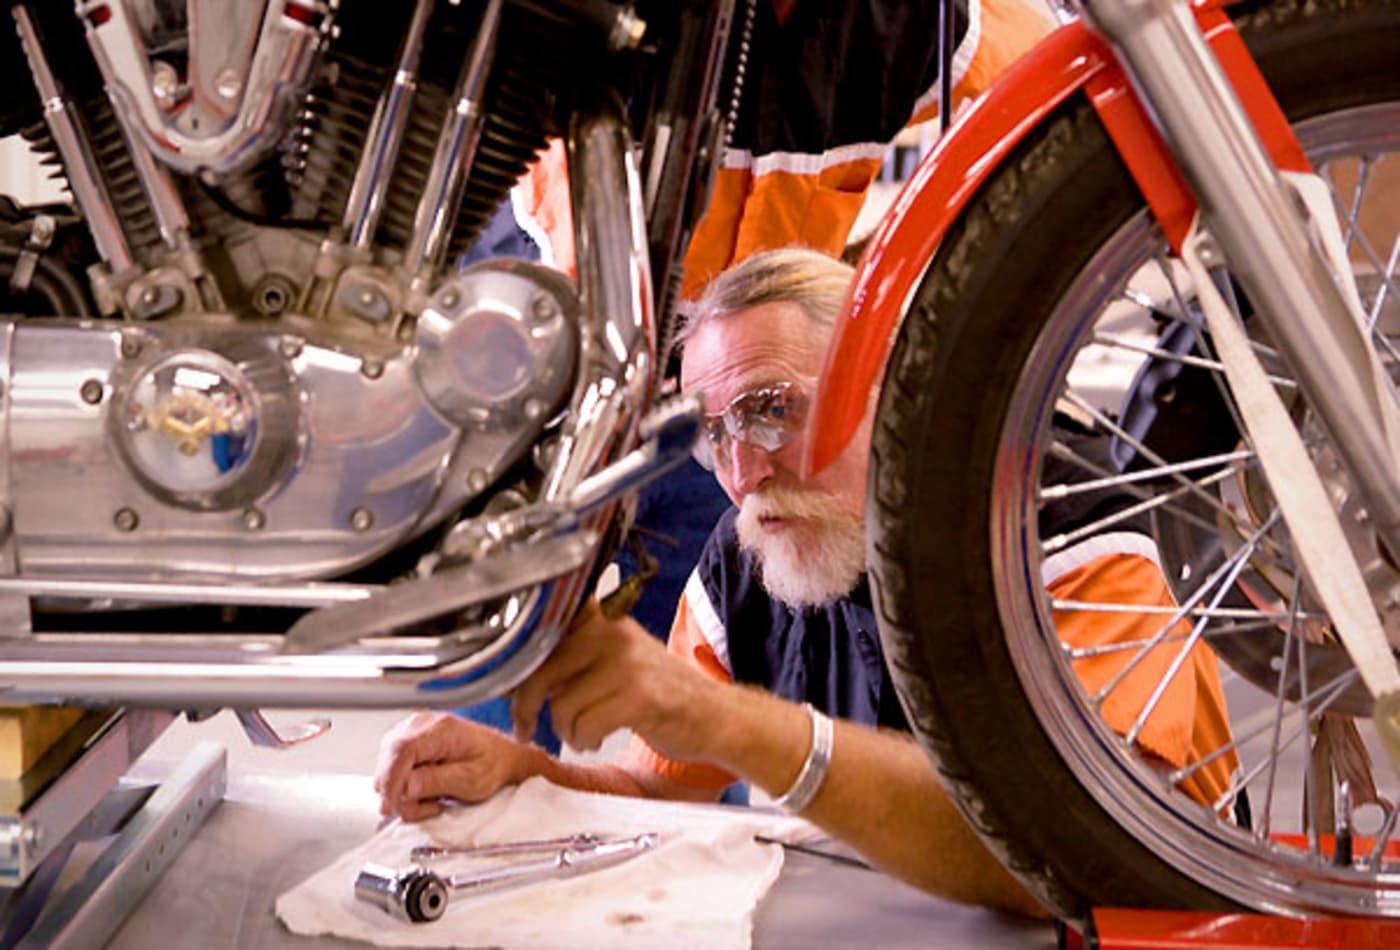 Motorcycle-Mechanic-New-Careers-After-40.jpg